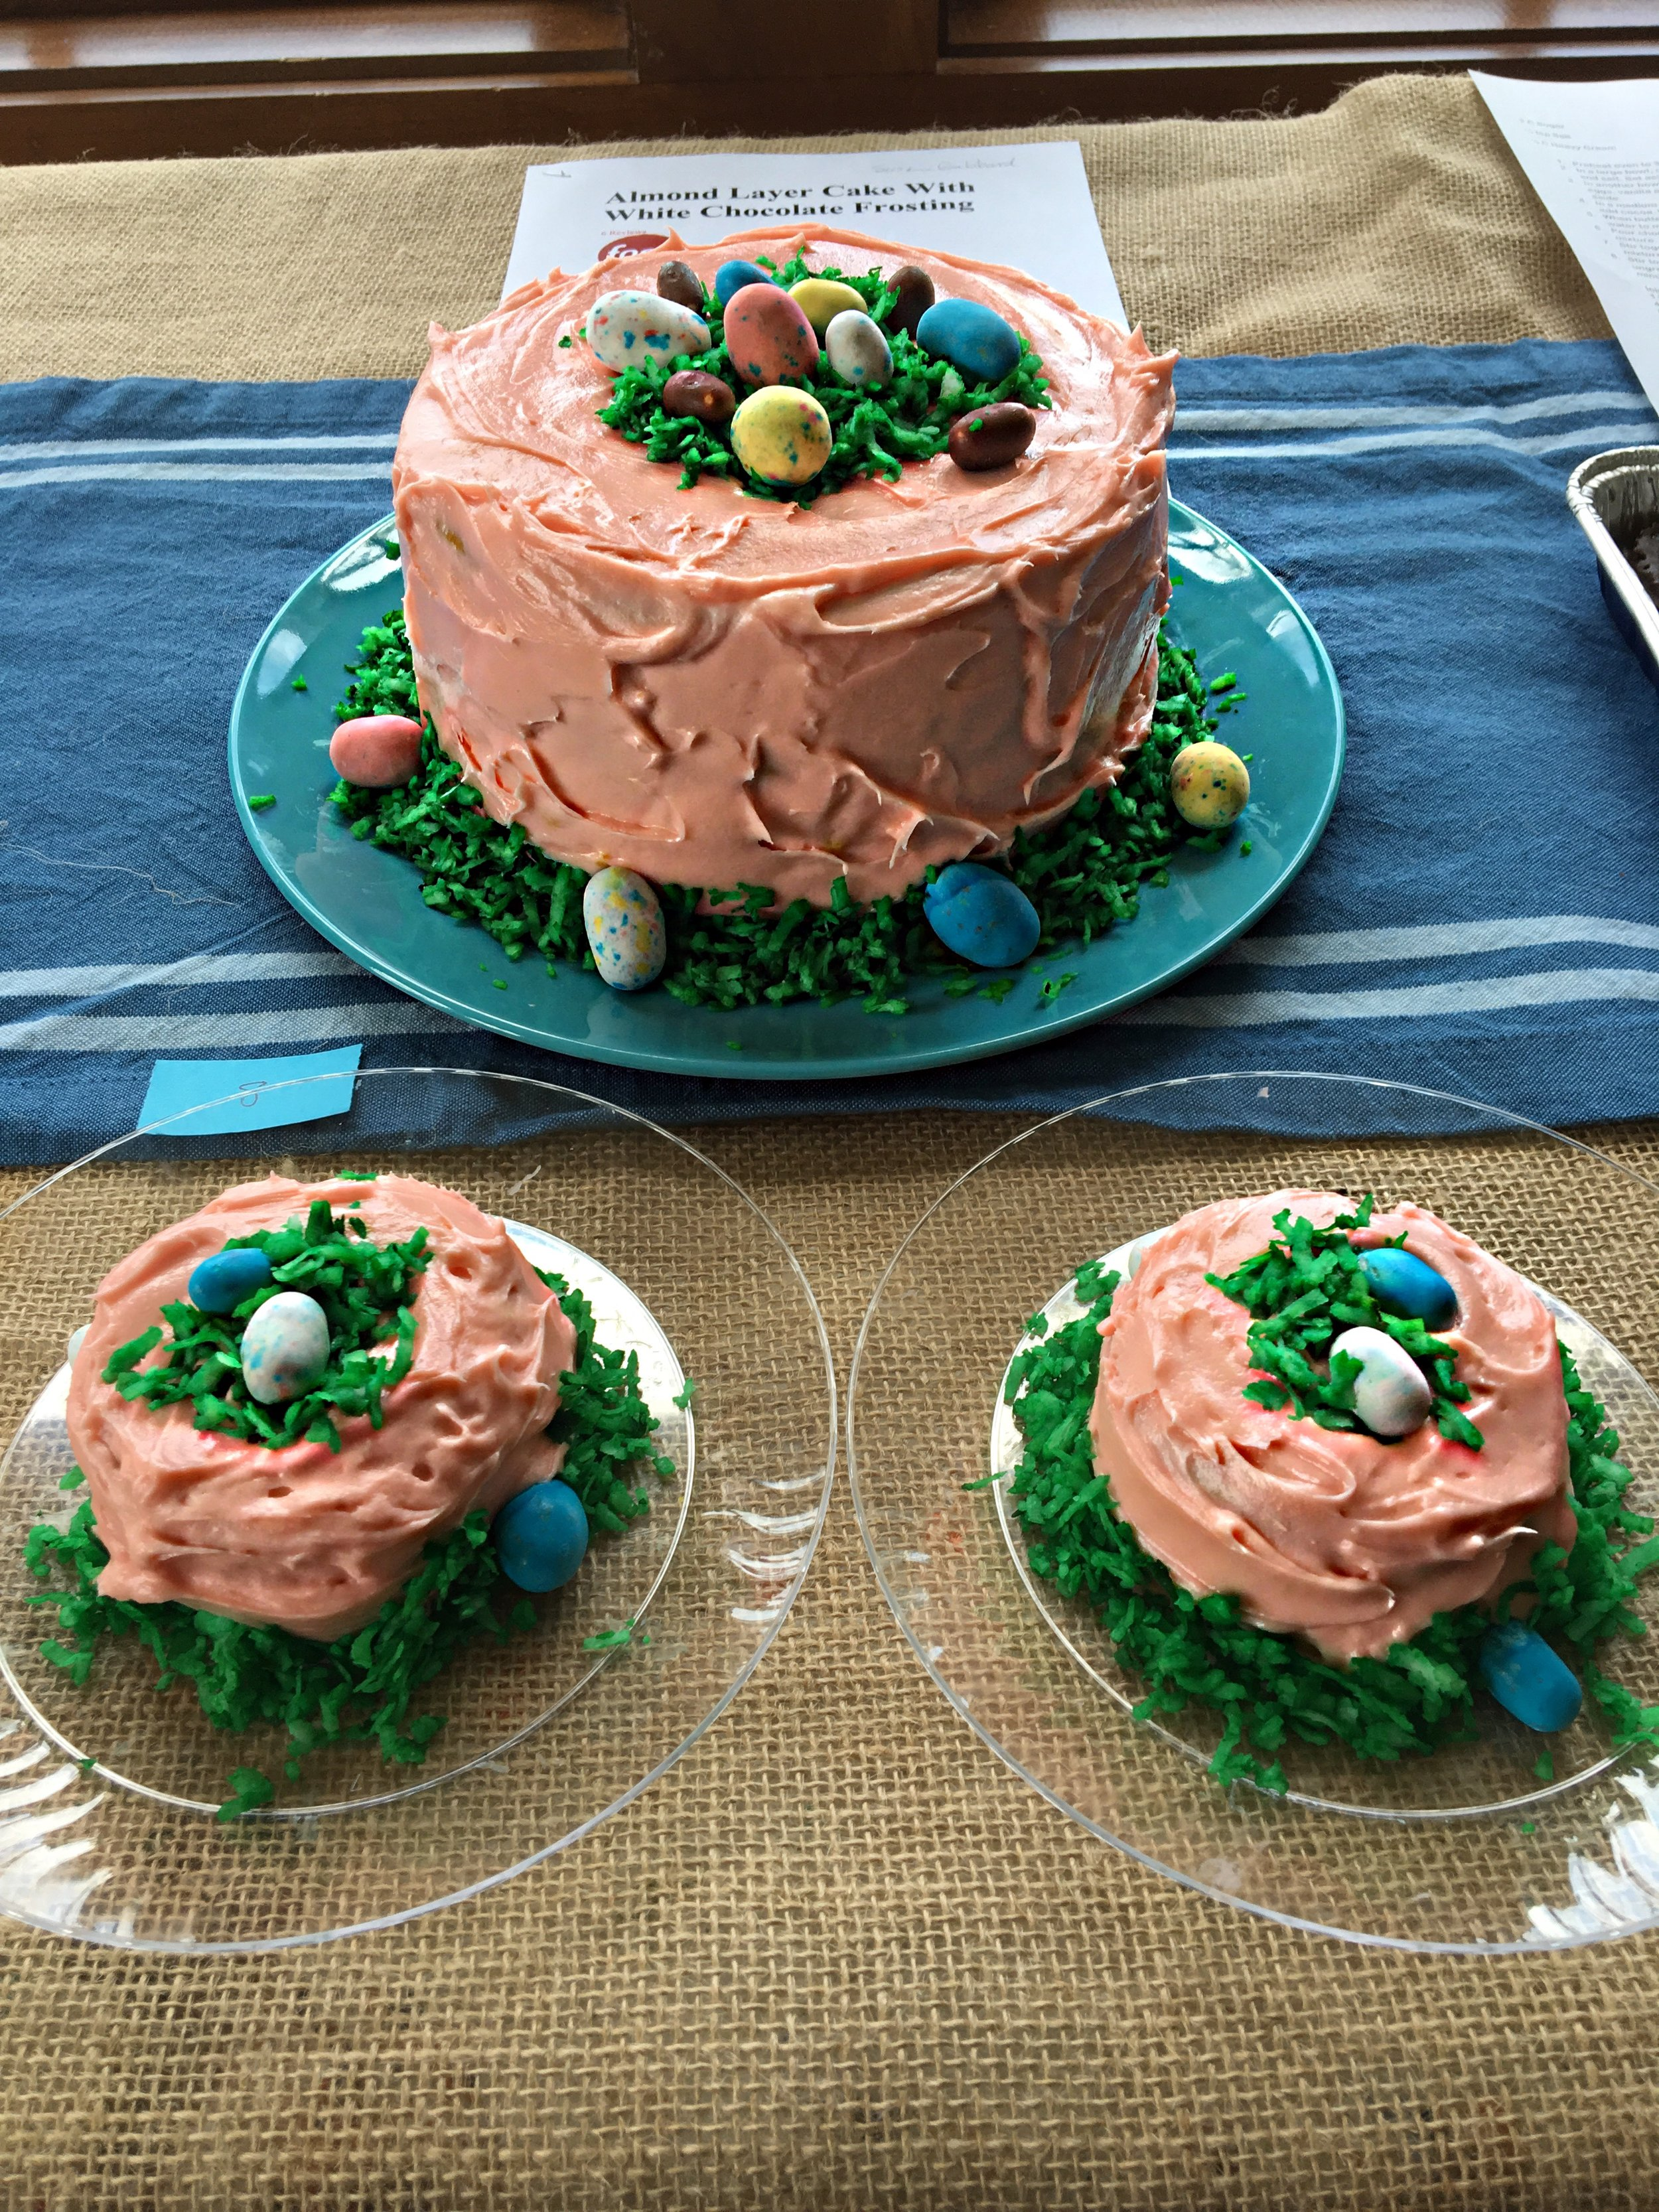 Third Place: Almond Layer Cake